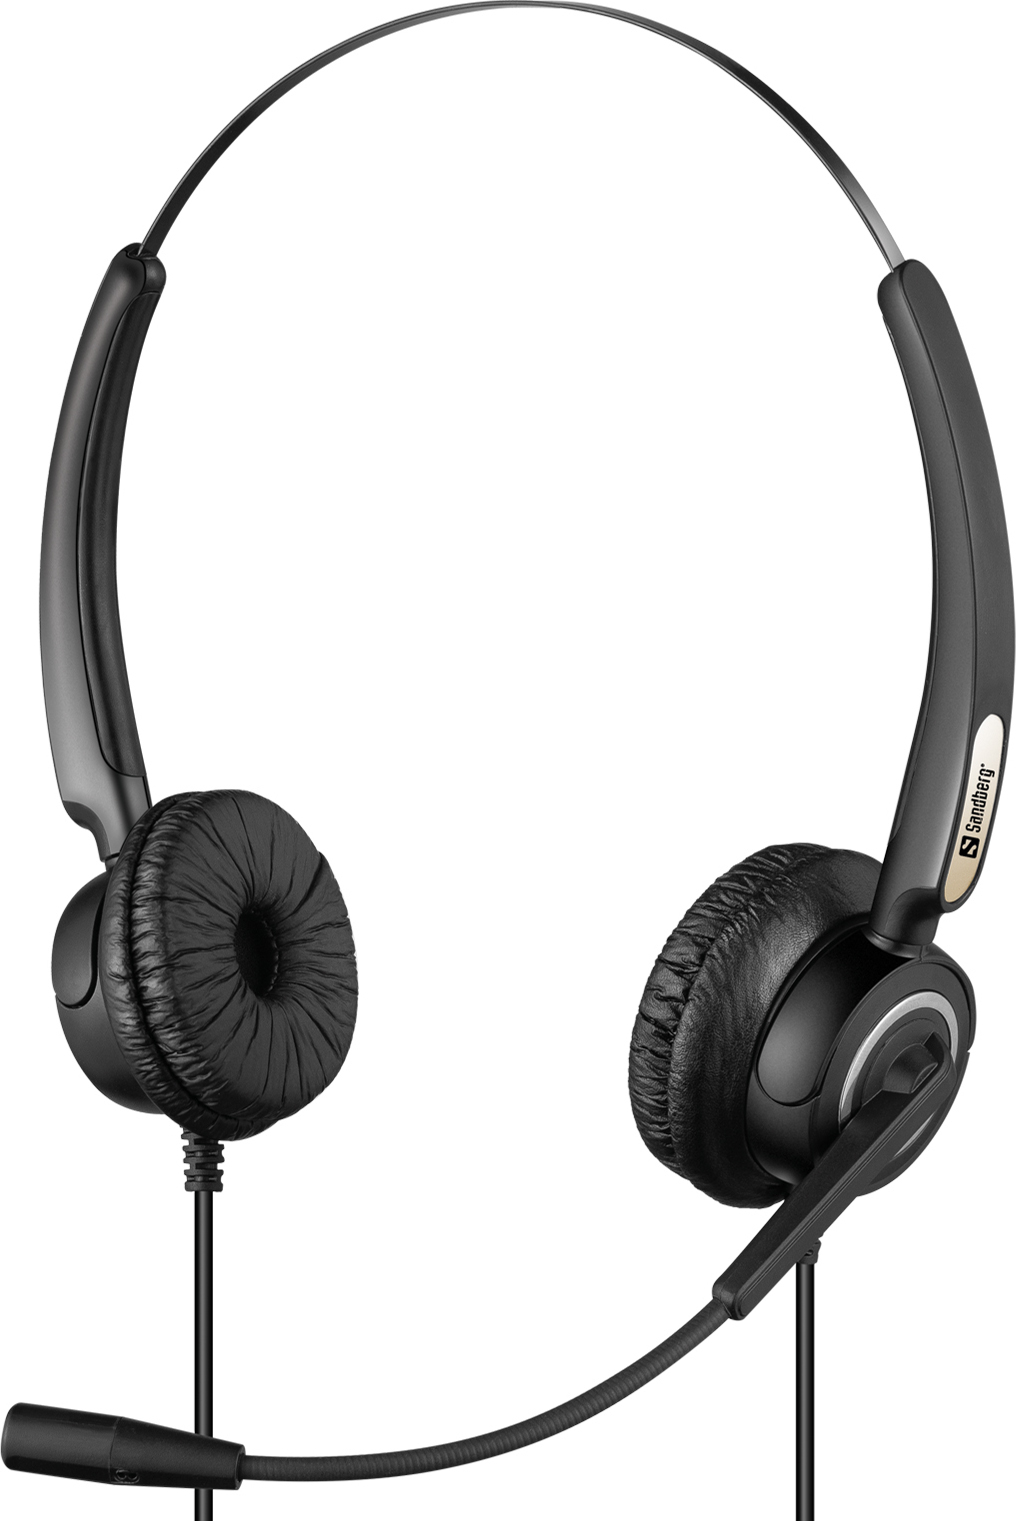 Sandberg USB Office Headset Pro Stereo USB Office Headset Pro  126-13 - eet01